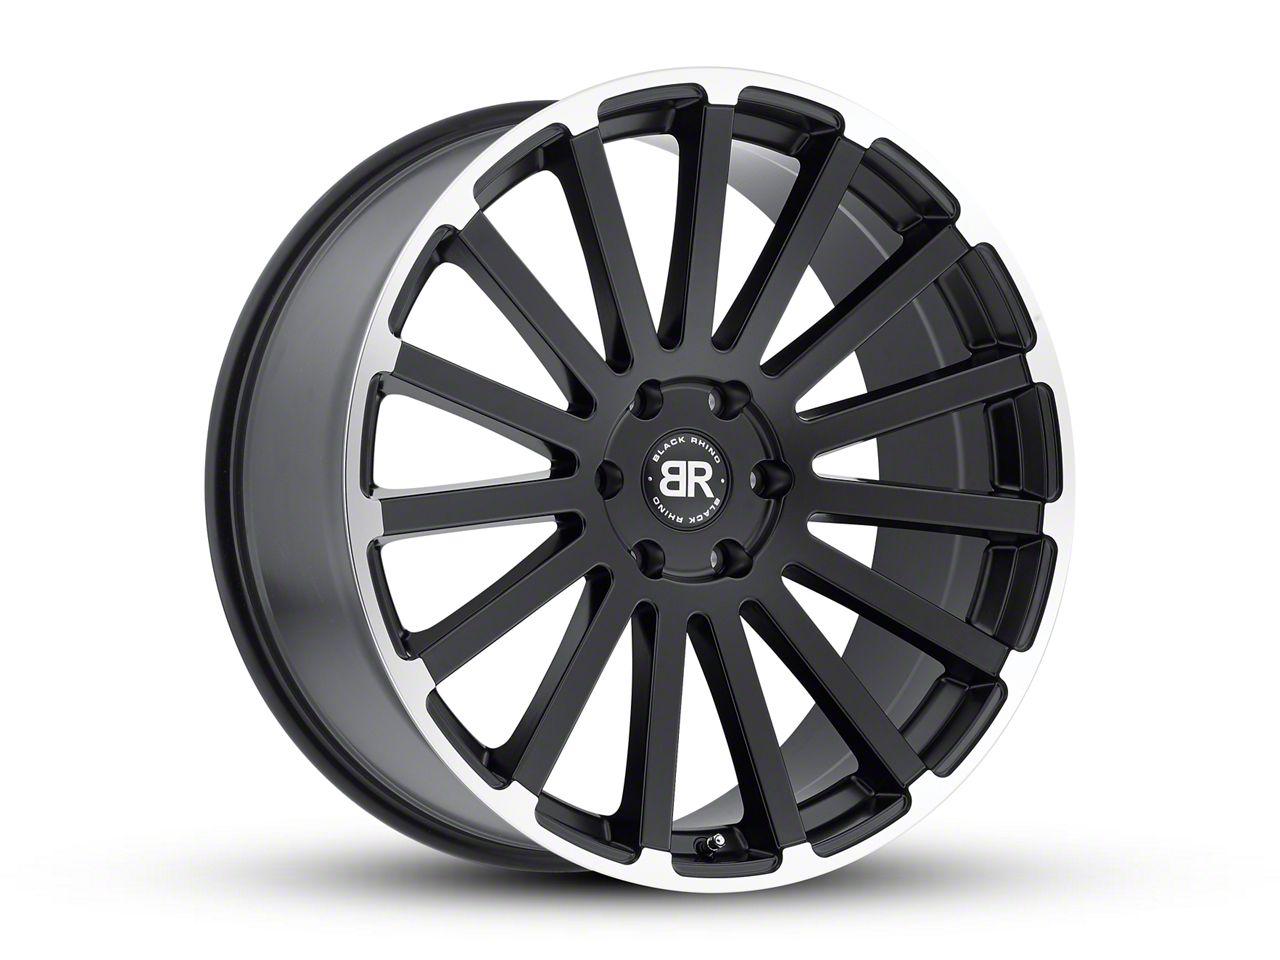 Black Rhino Spear Matte Black Machined 6-Lug Wheel - 22x9.5 (07-18 Sierra 1500)